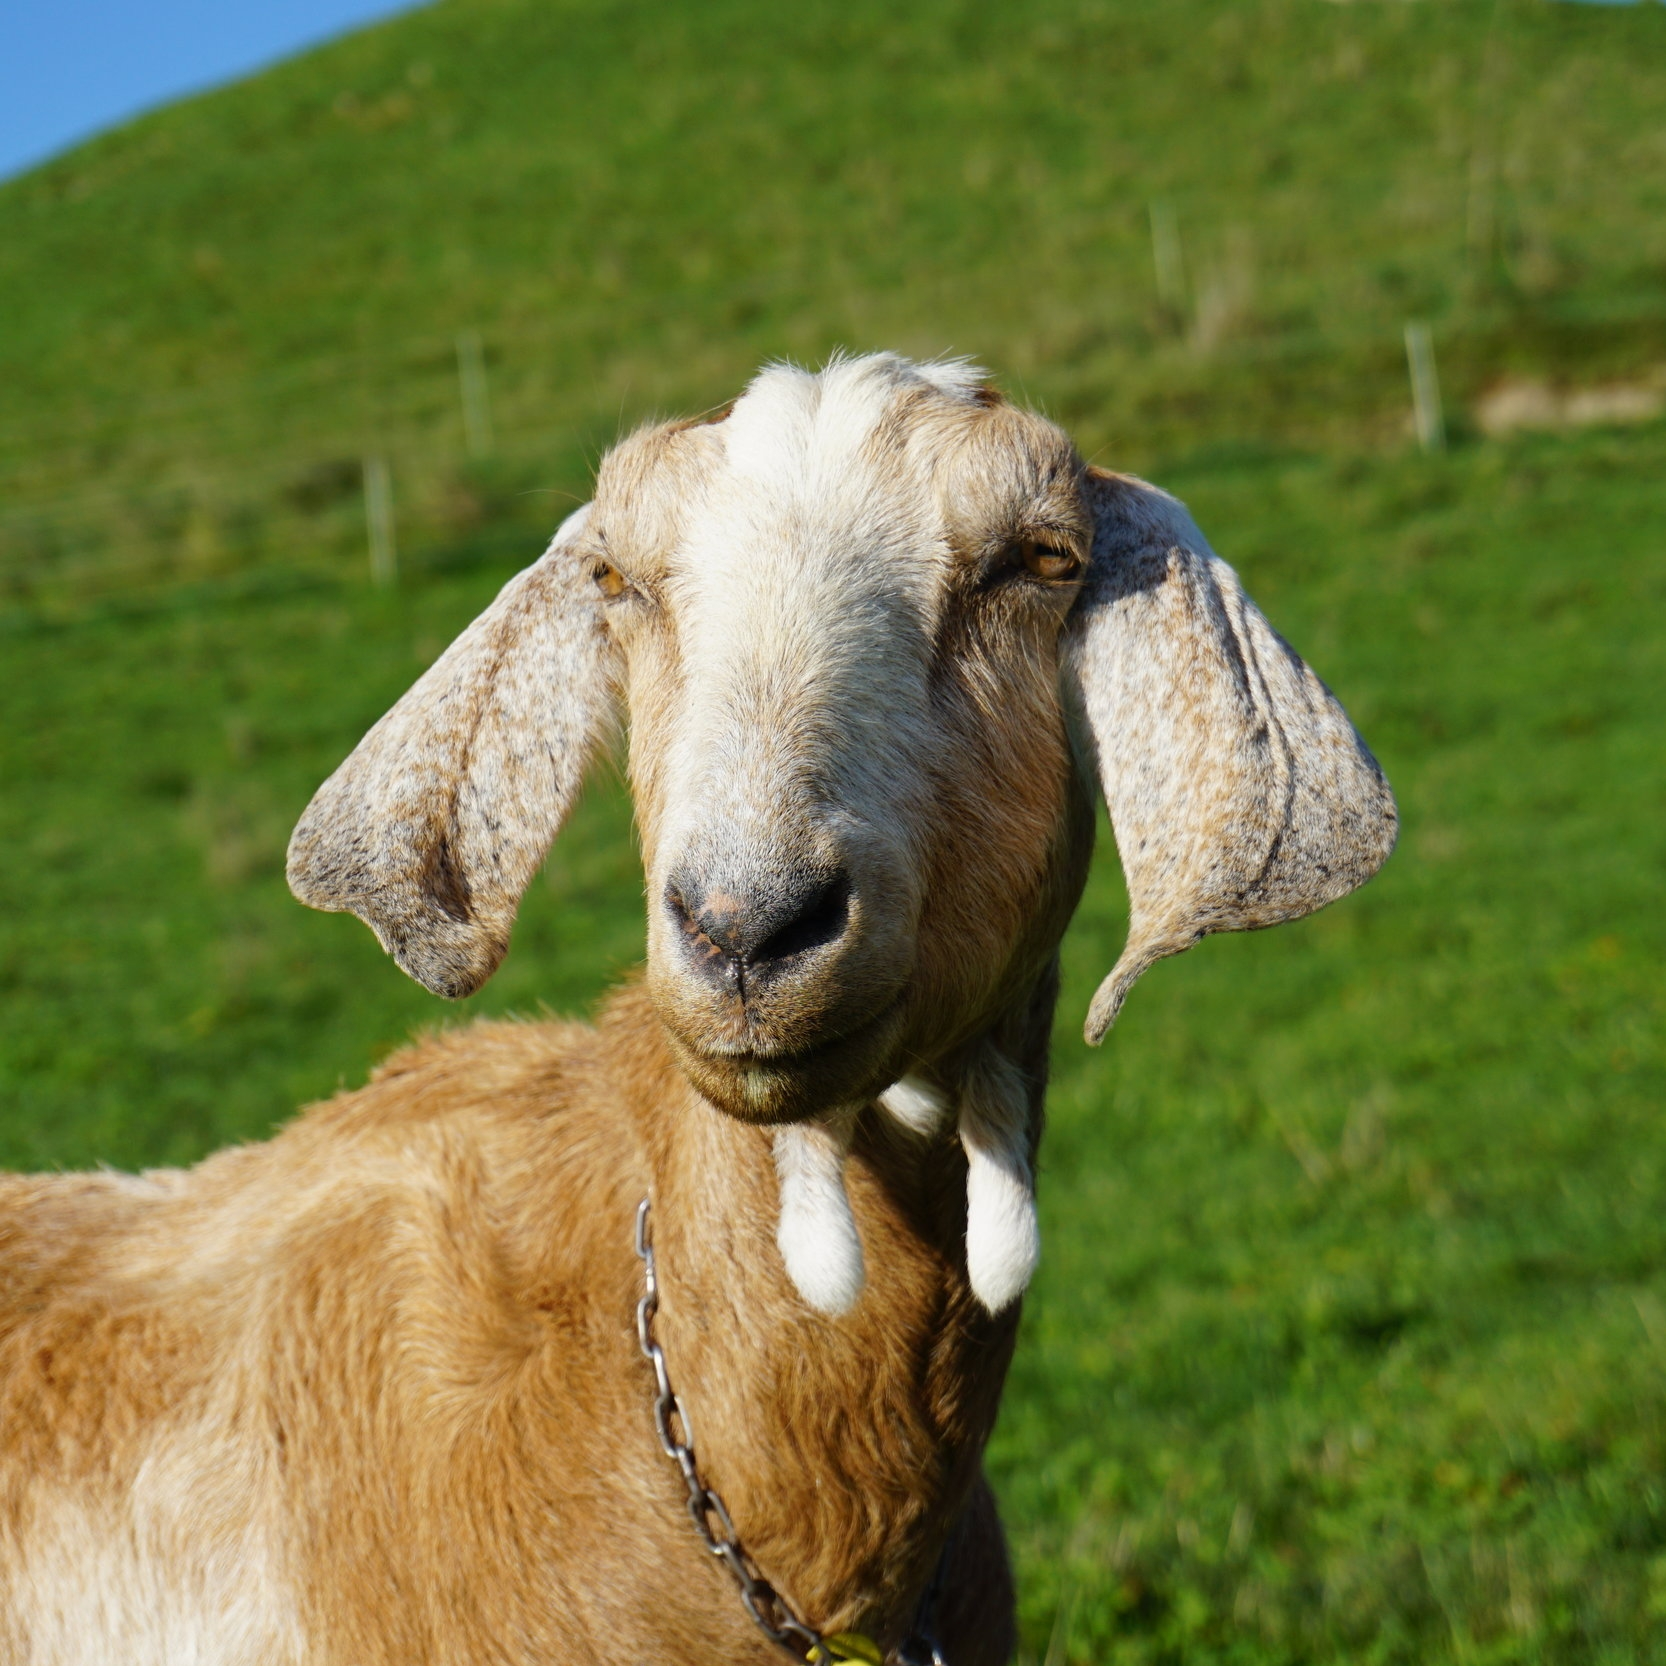 Jacinda   COG - Chief Operating Goat